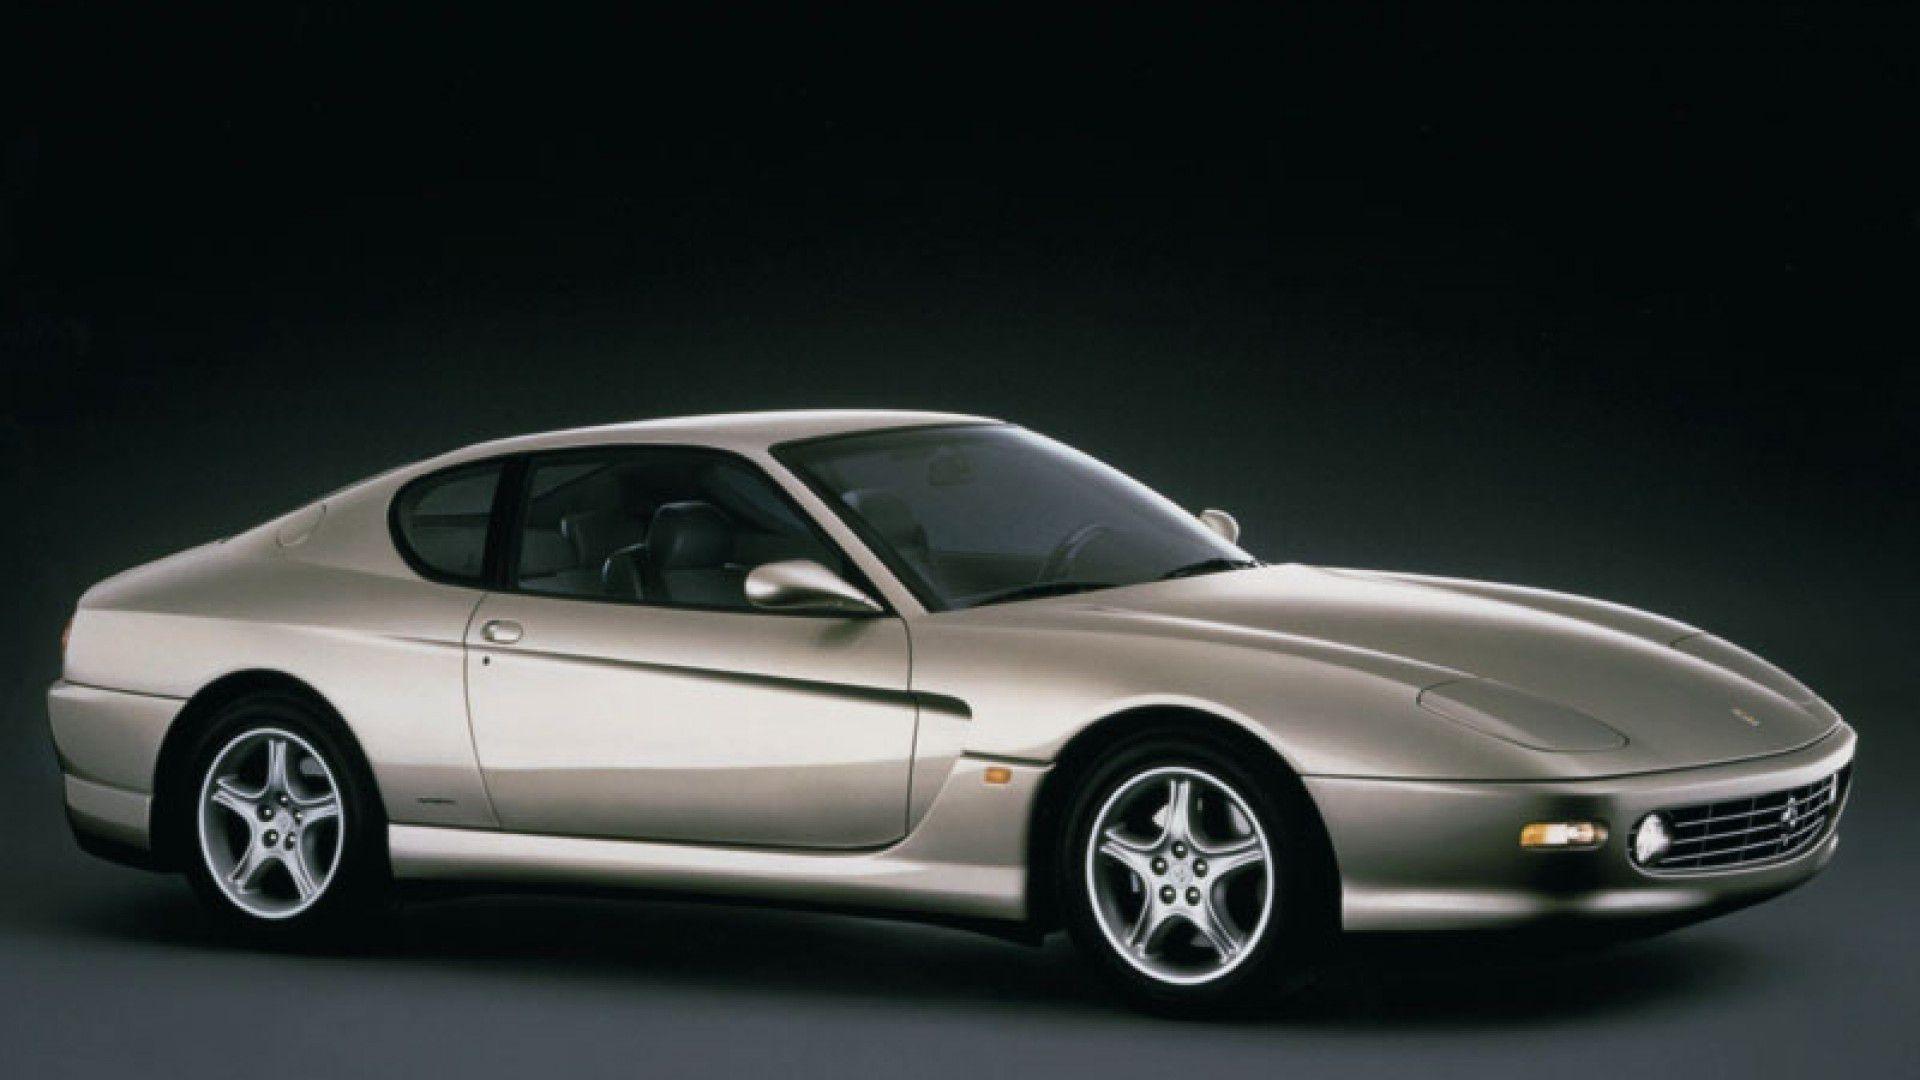 Ferrari 456 GT & GTA Coupe